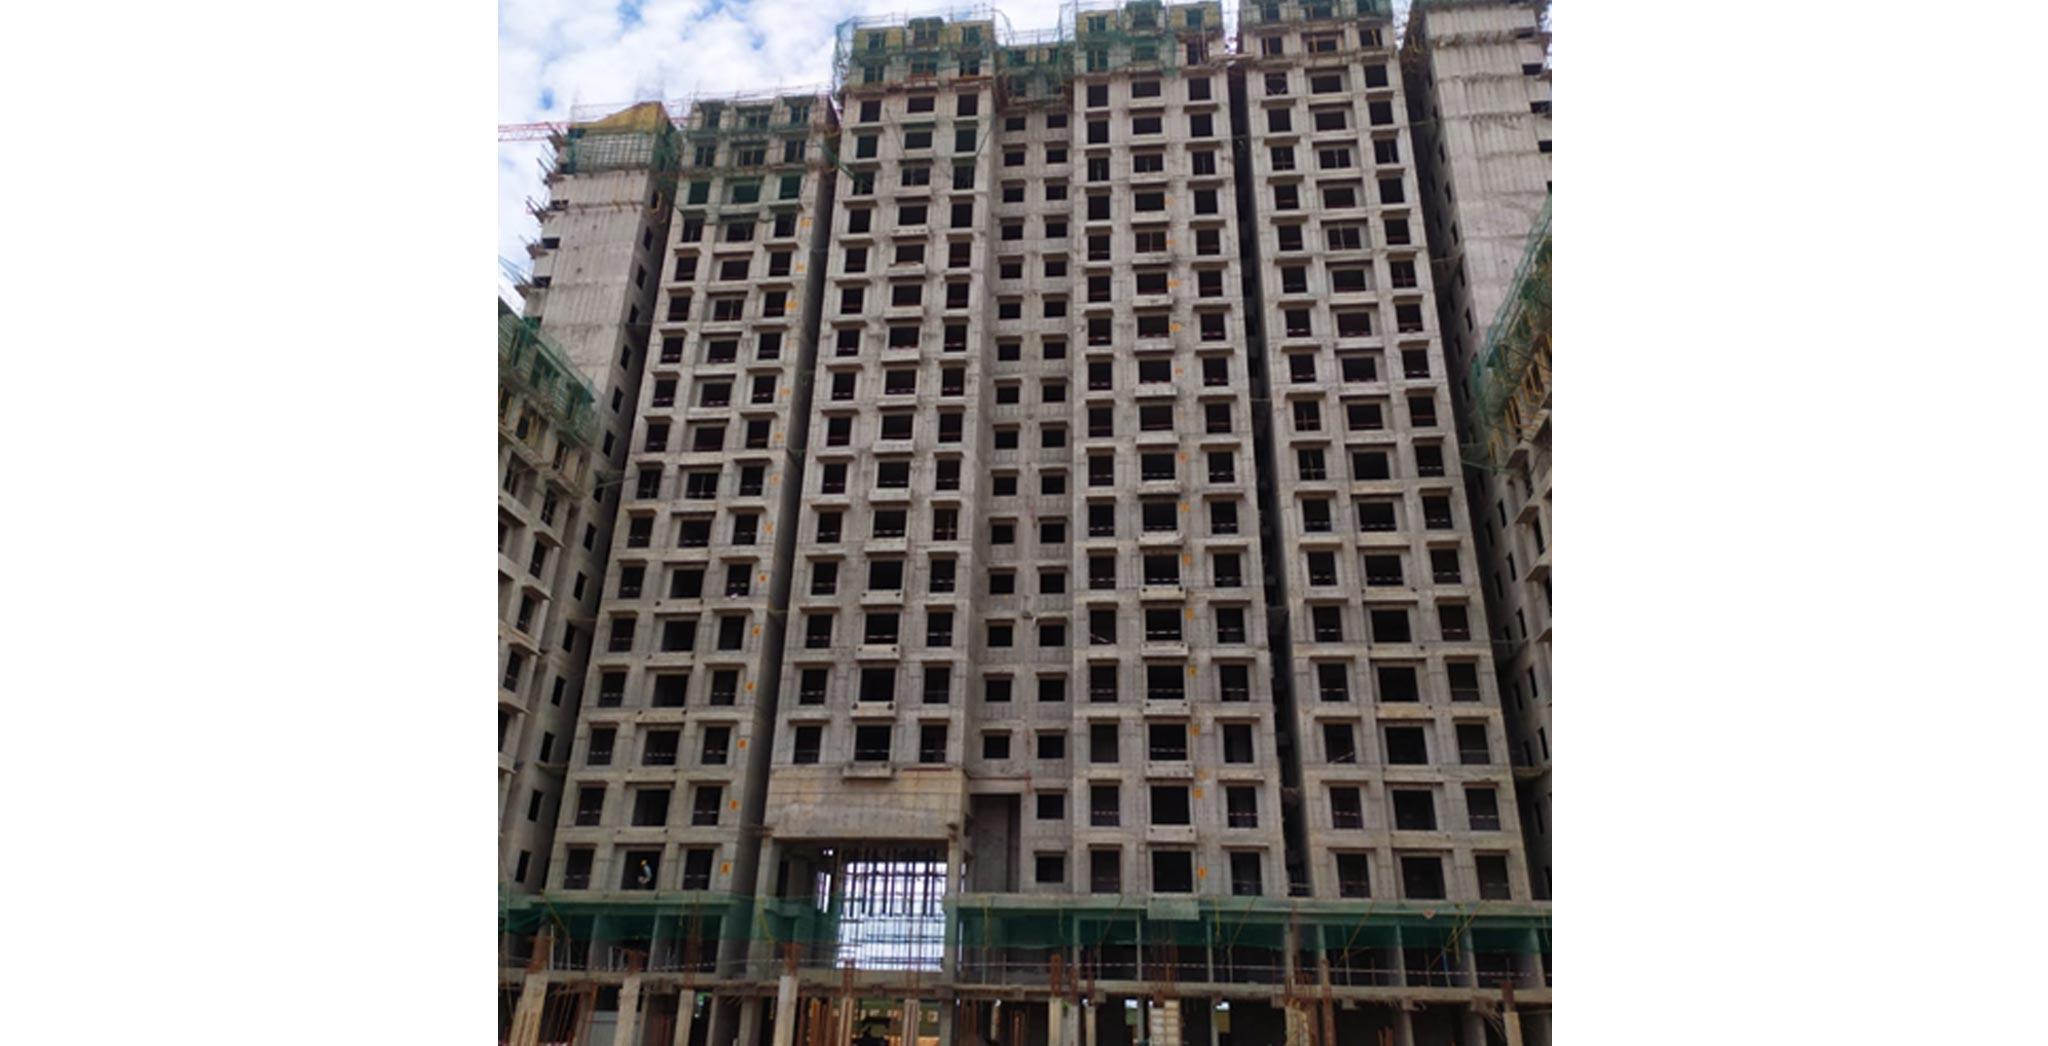 Aug 2021 - Gallium Block: On Commencement of eighteenth floor slab